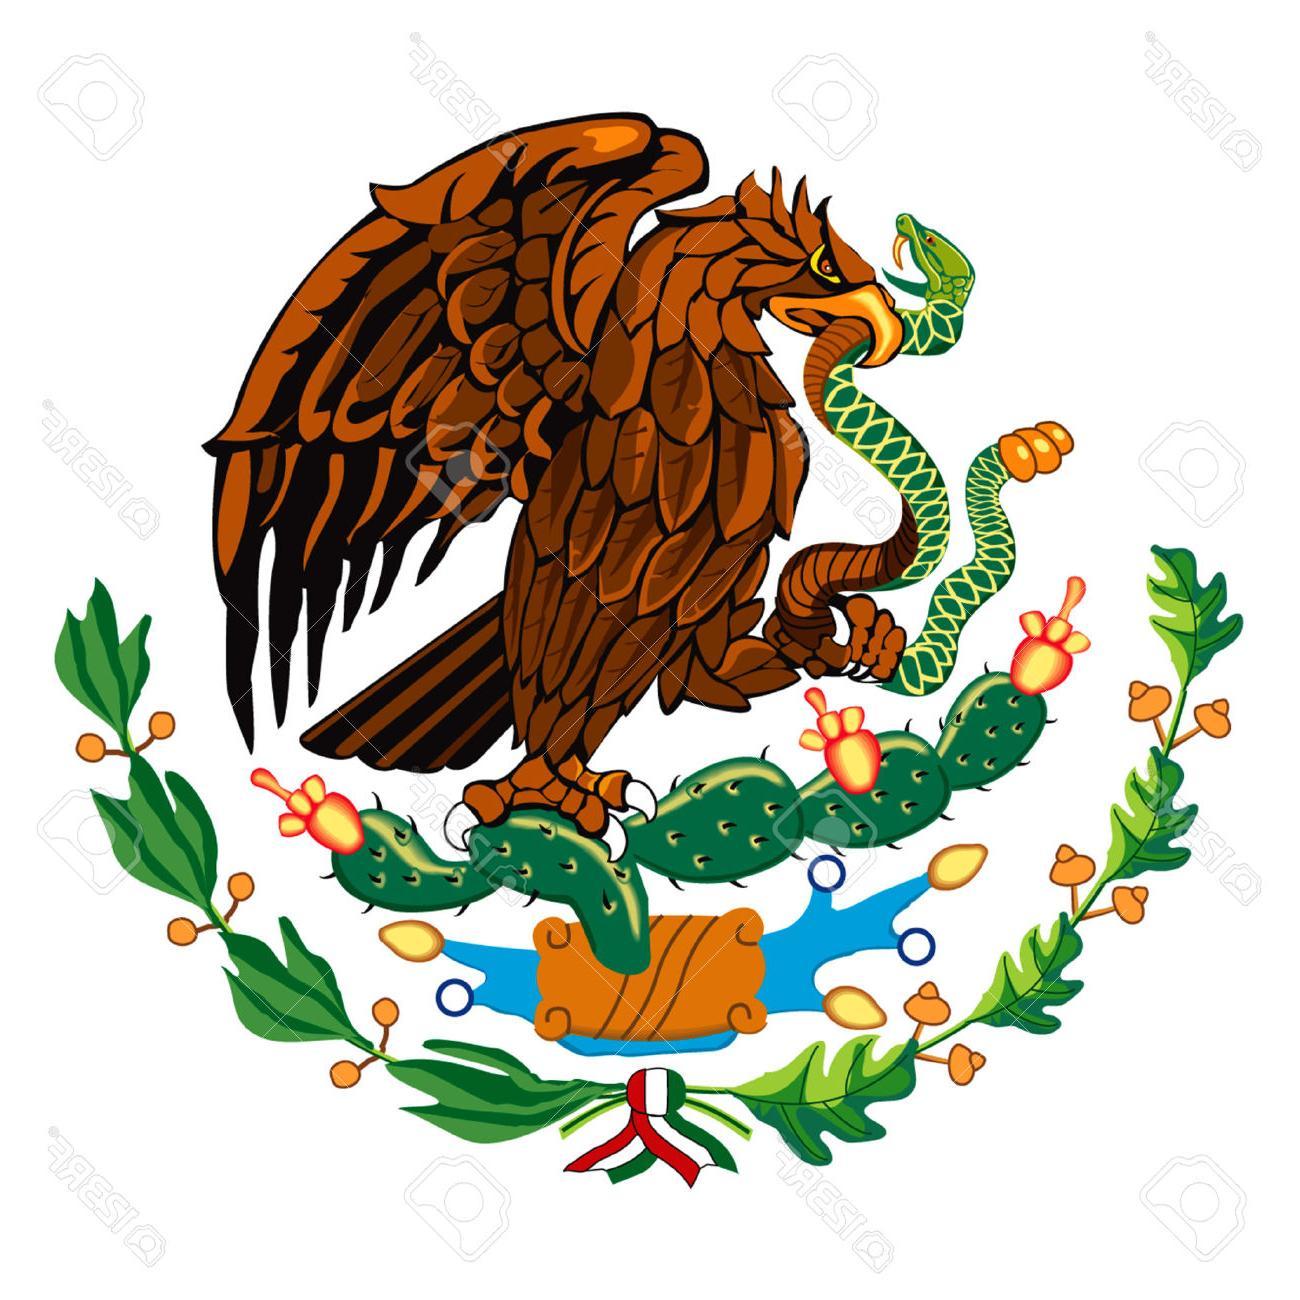 1300x1300 Sturdy Mexican Flag Drawings Symbol Clipart Best 16 De Septiembre